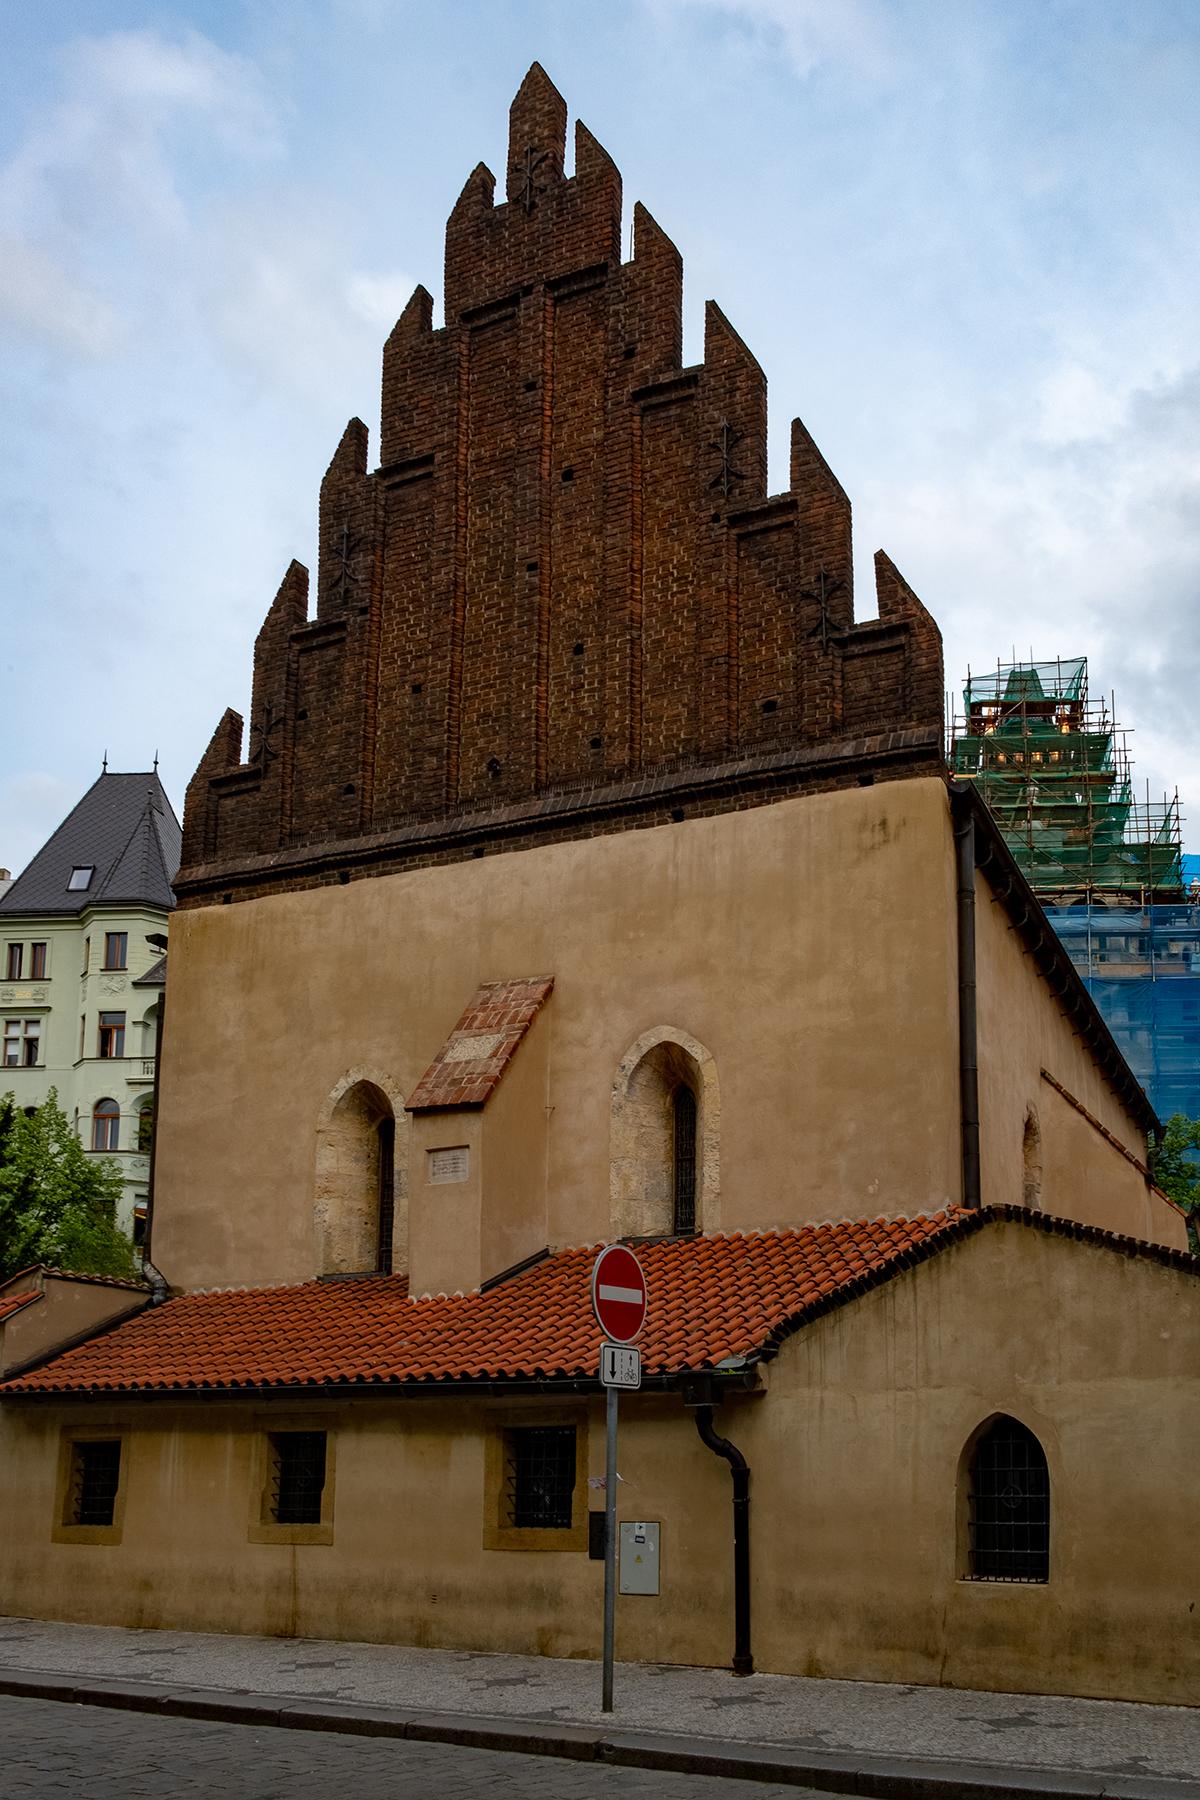 La Sinagoga Vecchionuova